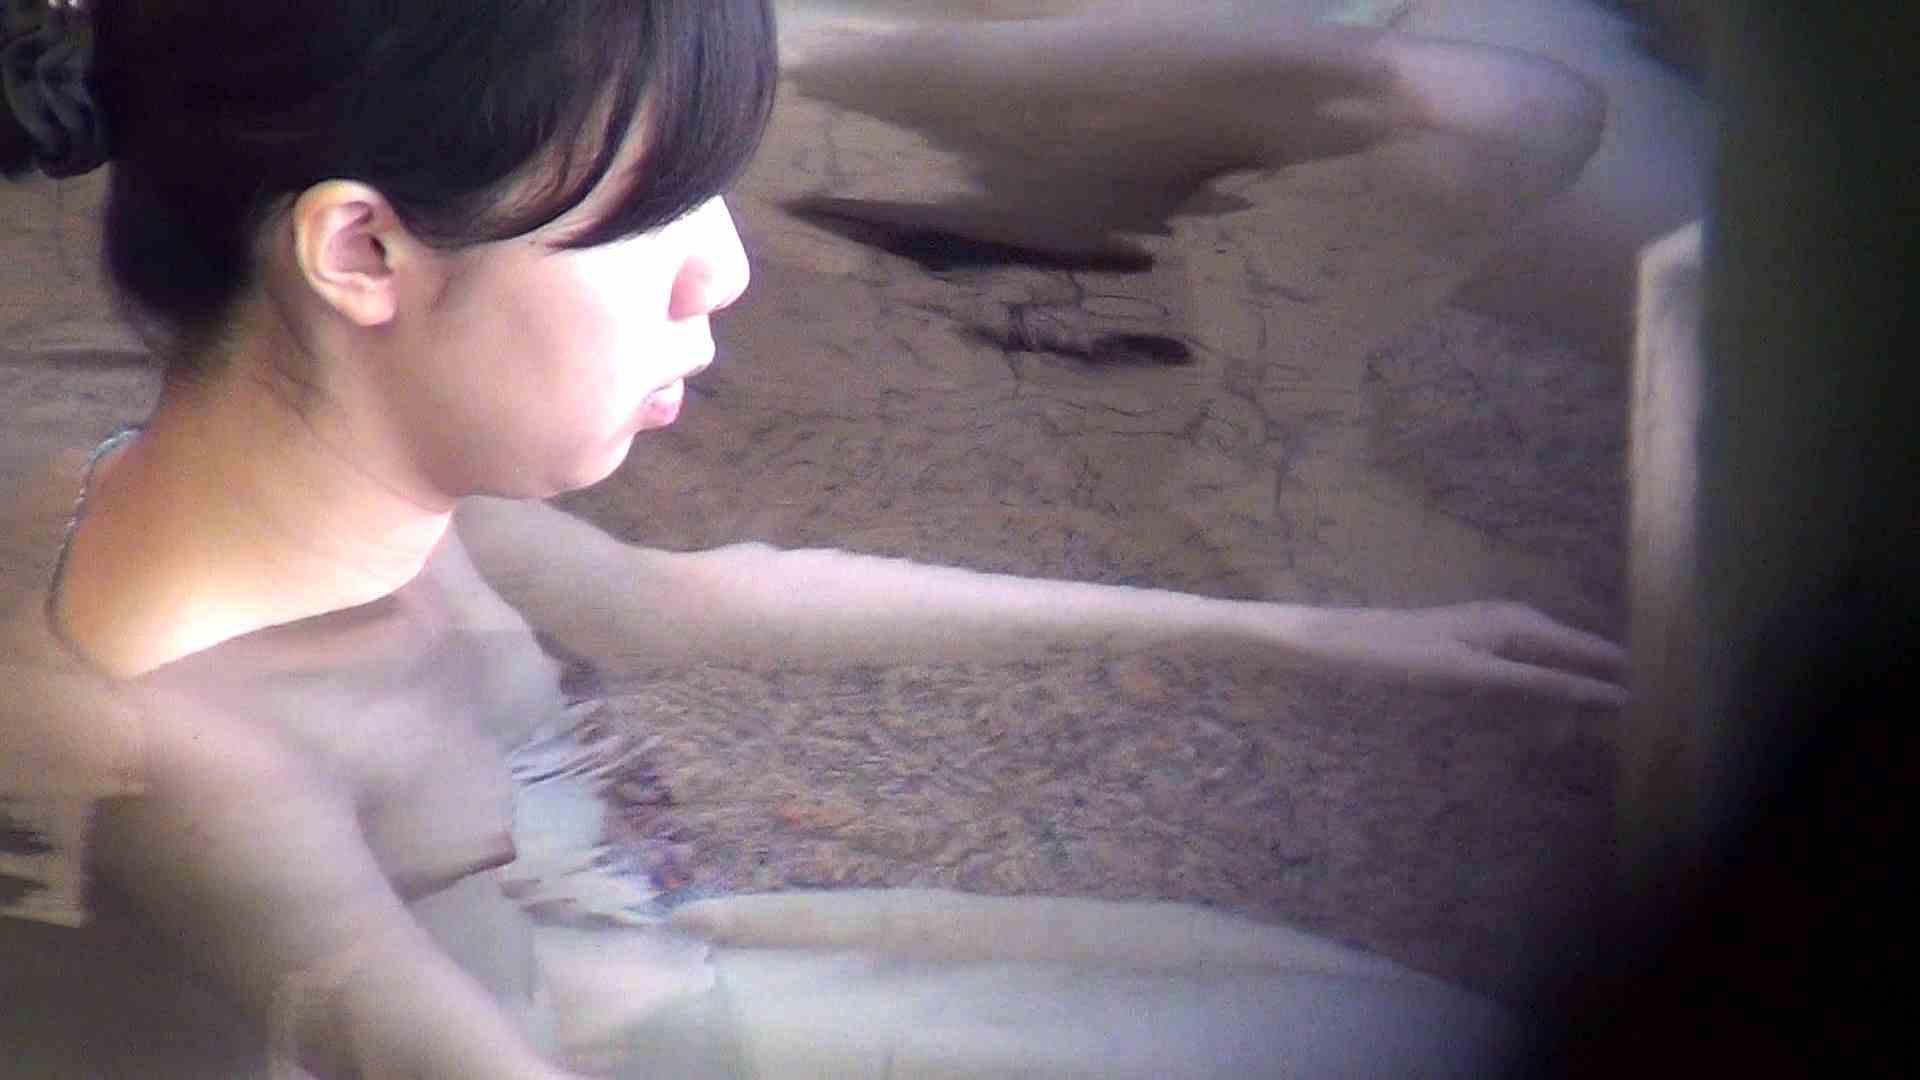 Vol.55 モッチリした肉質の色白お女市さま 桃色乳首 オメコ無修正動画無料 50画像 47